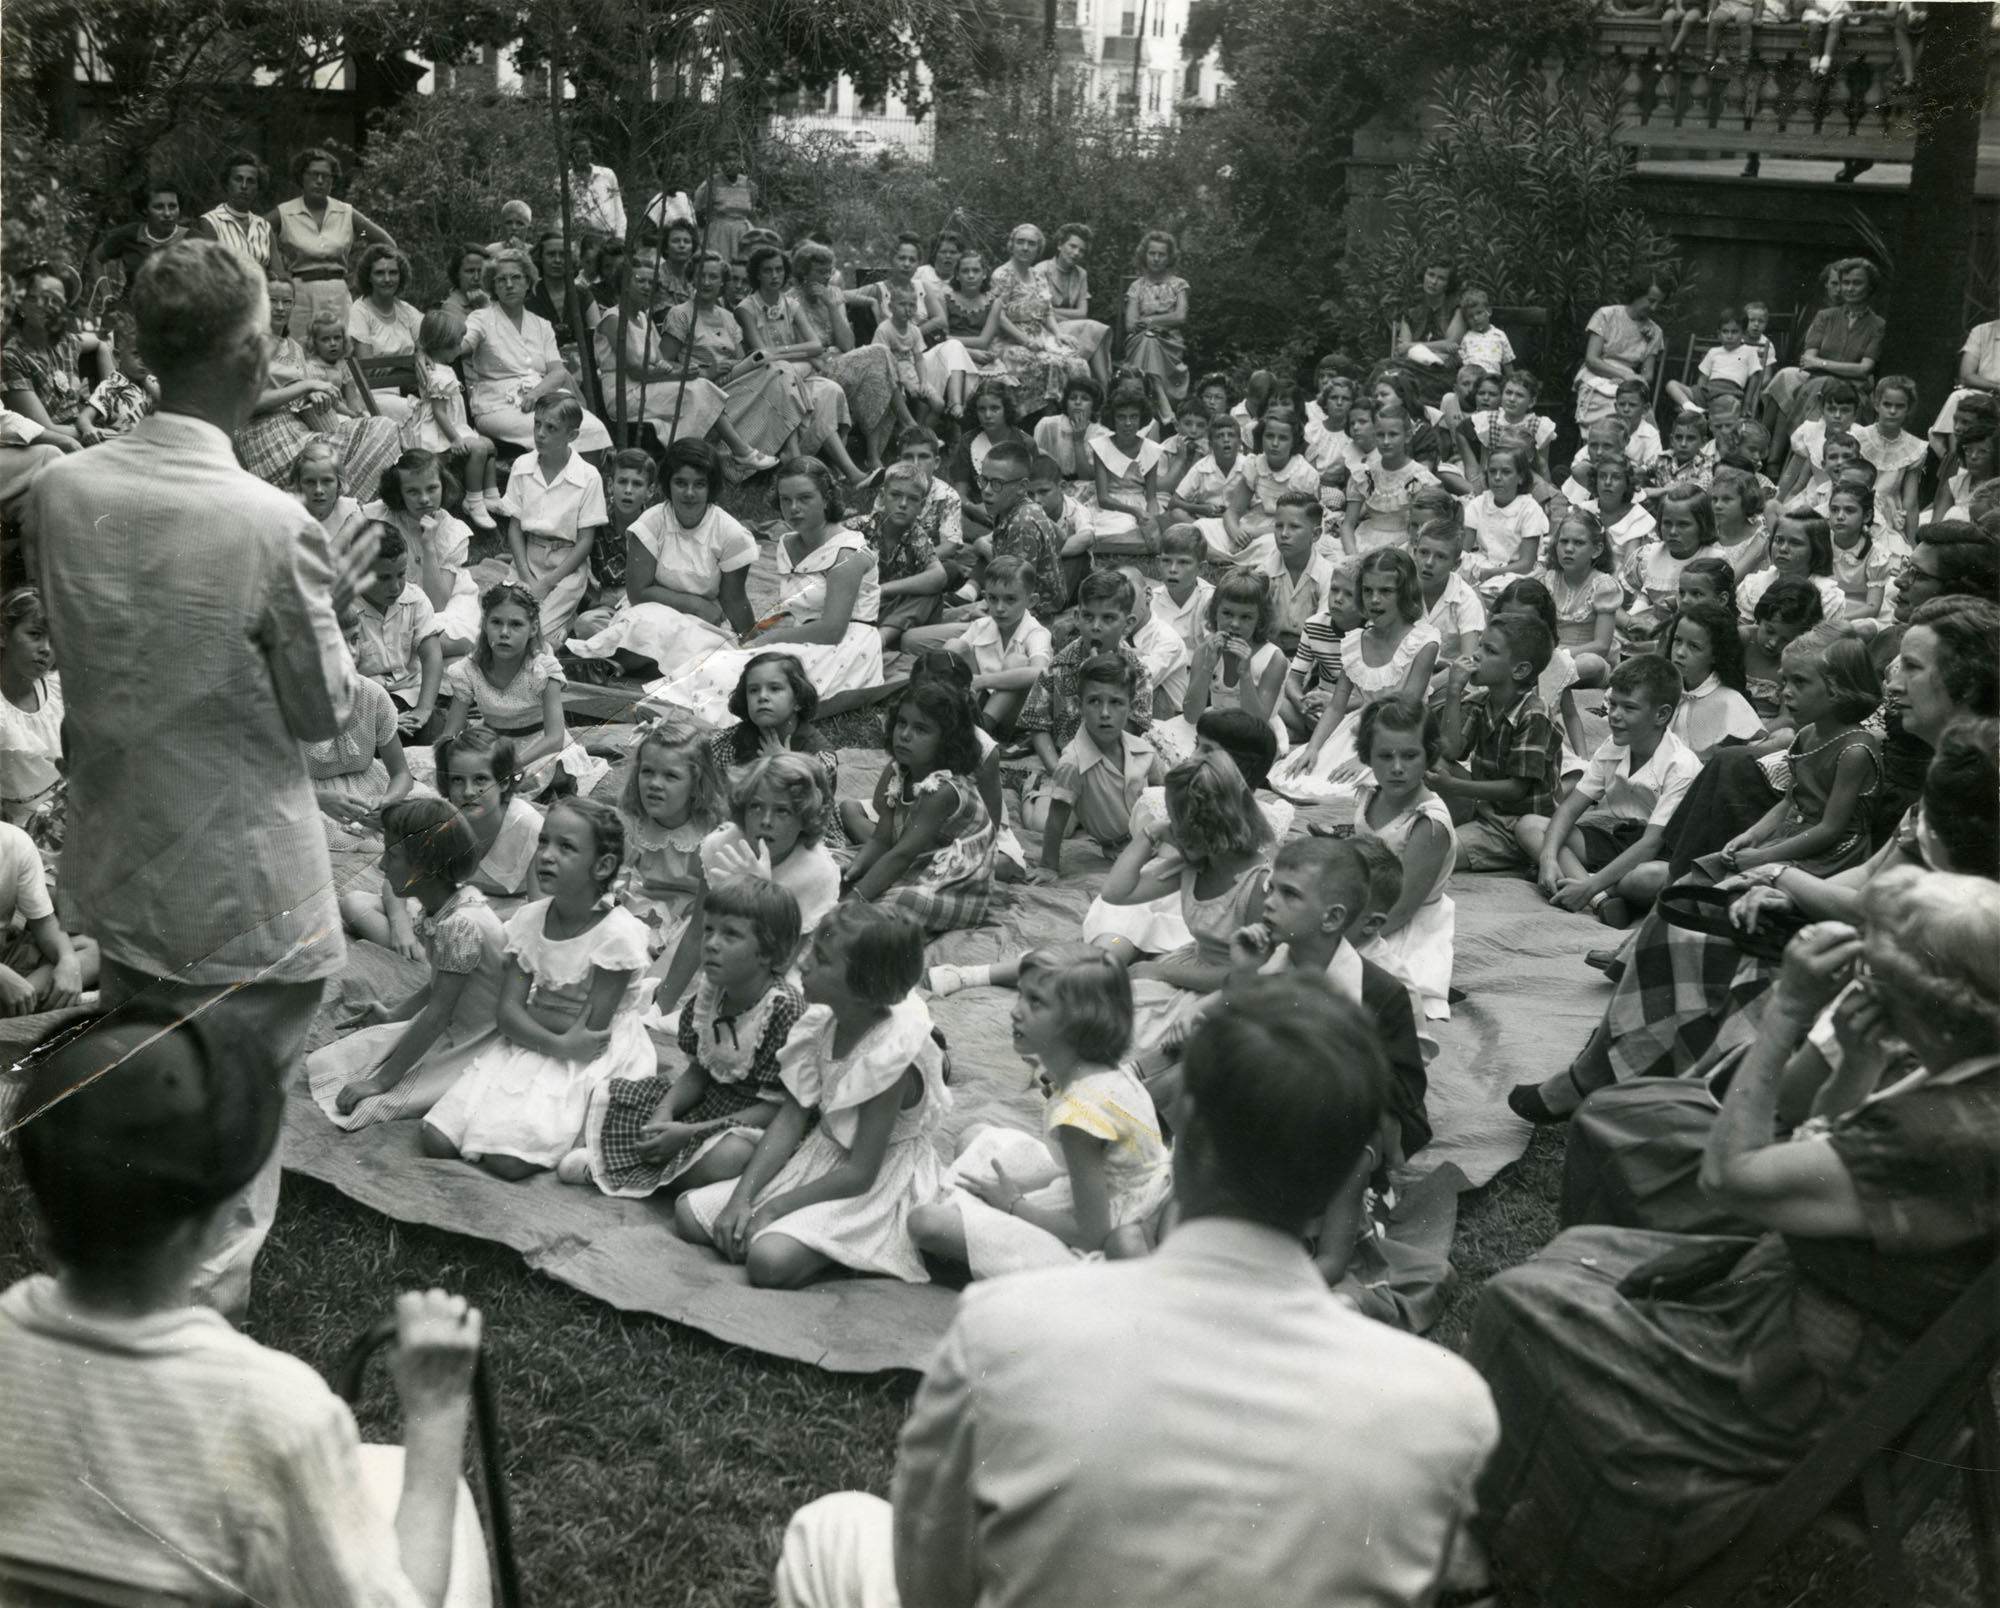 Summer reading closing exercises, Main Library, 1952 (1)